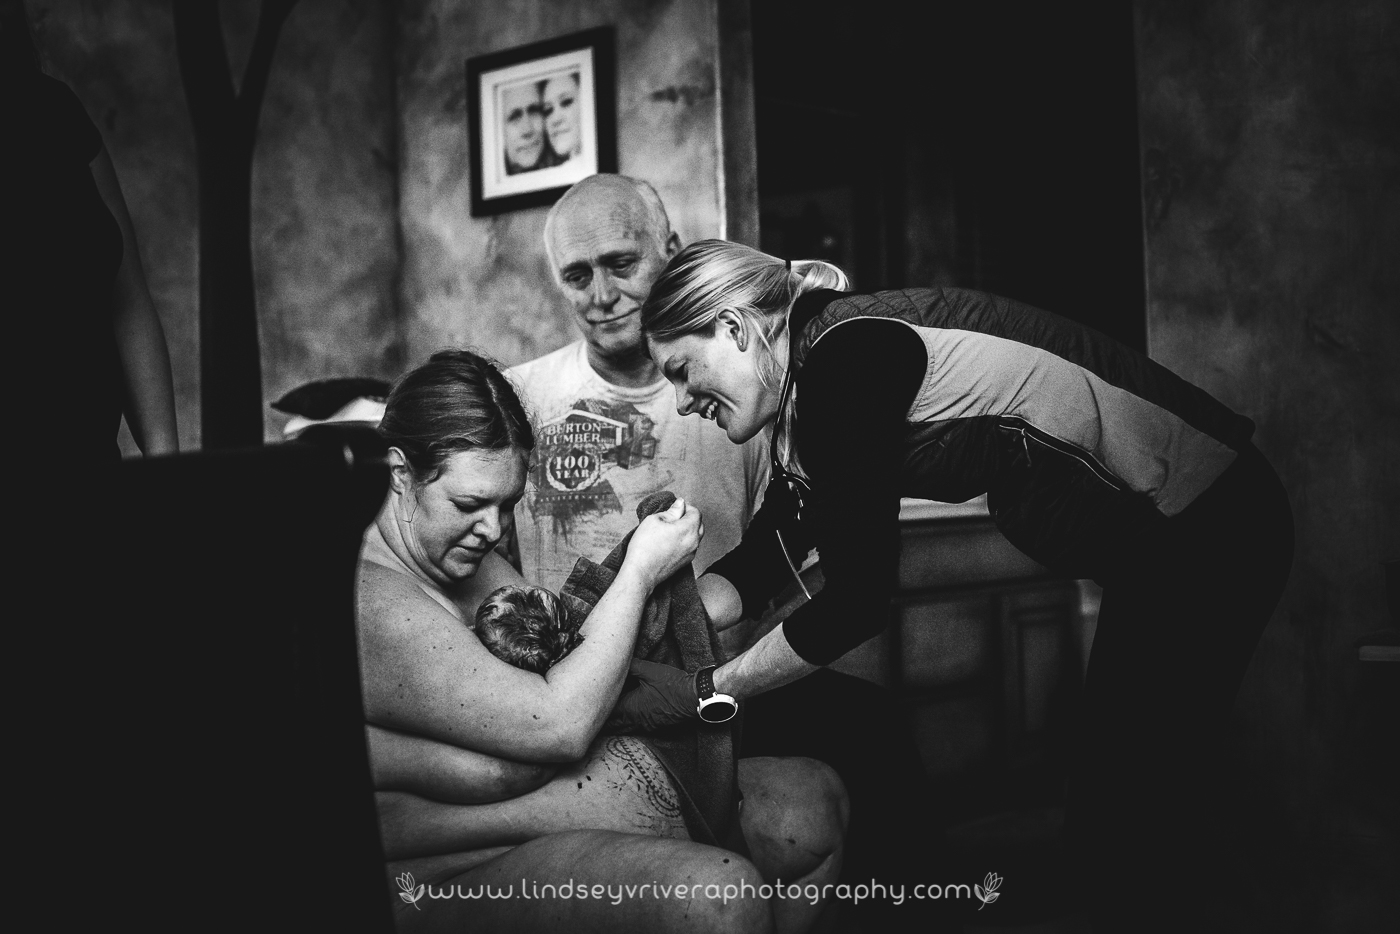 Home-Birth-Born-Photography-Salt-Lake-City,-Wasatch-Midwifery-&-Wellness,-Just-Born22.jpg